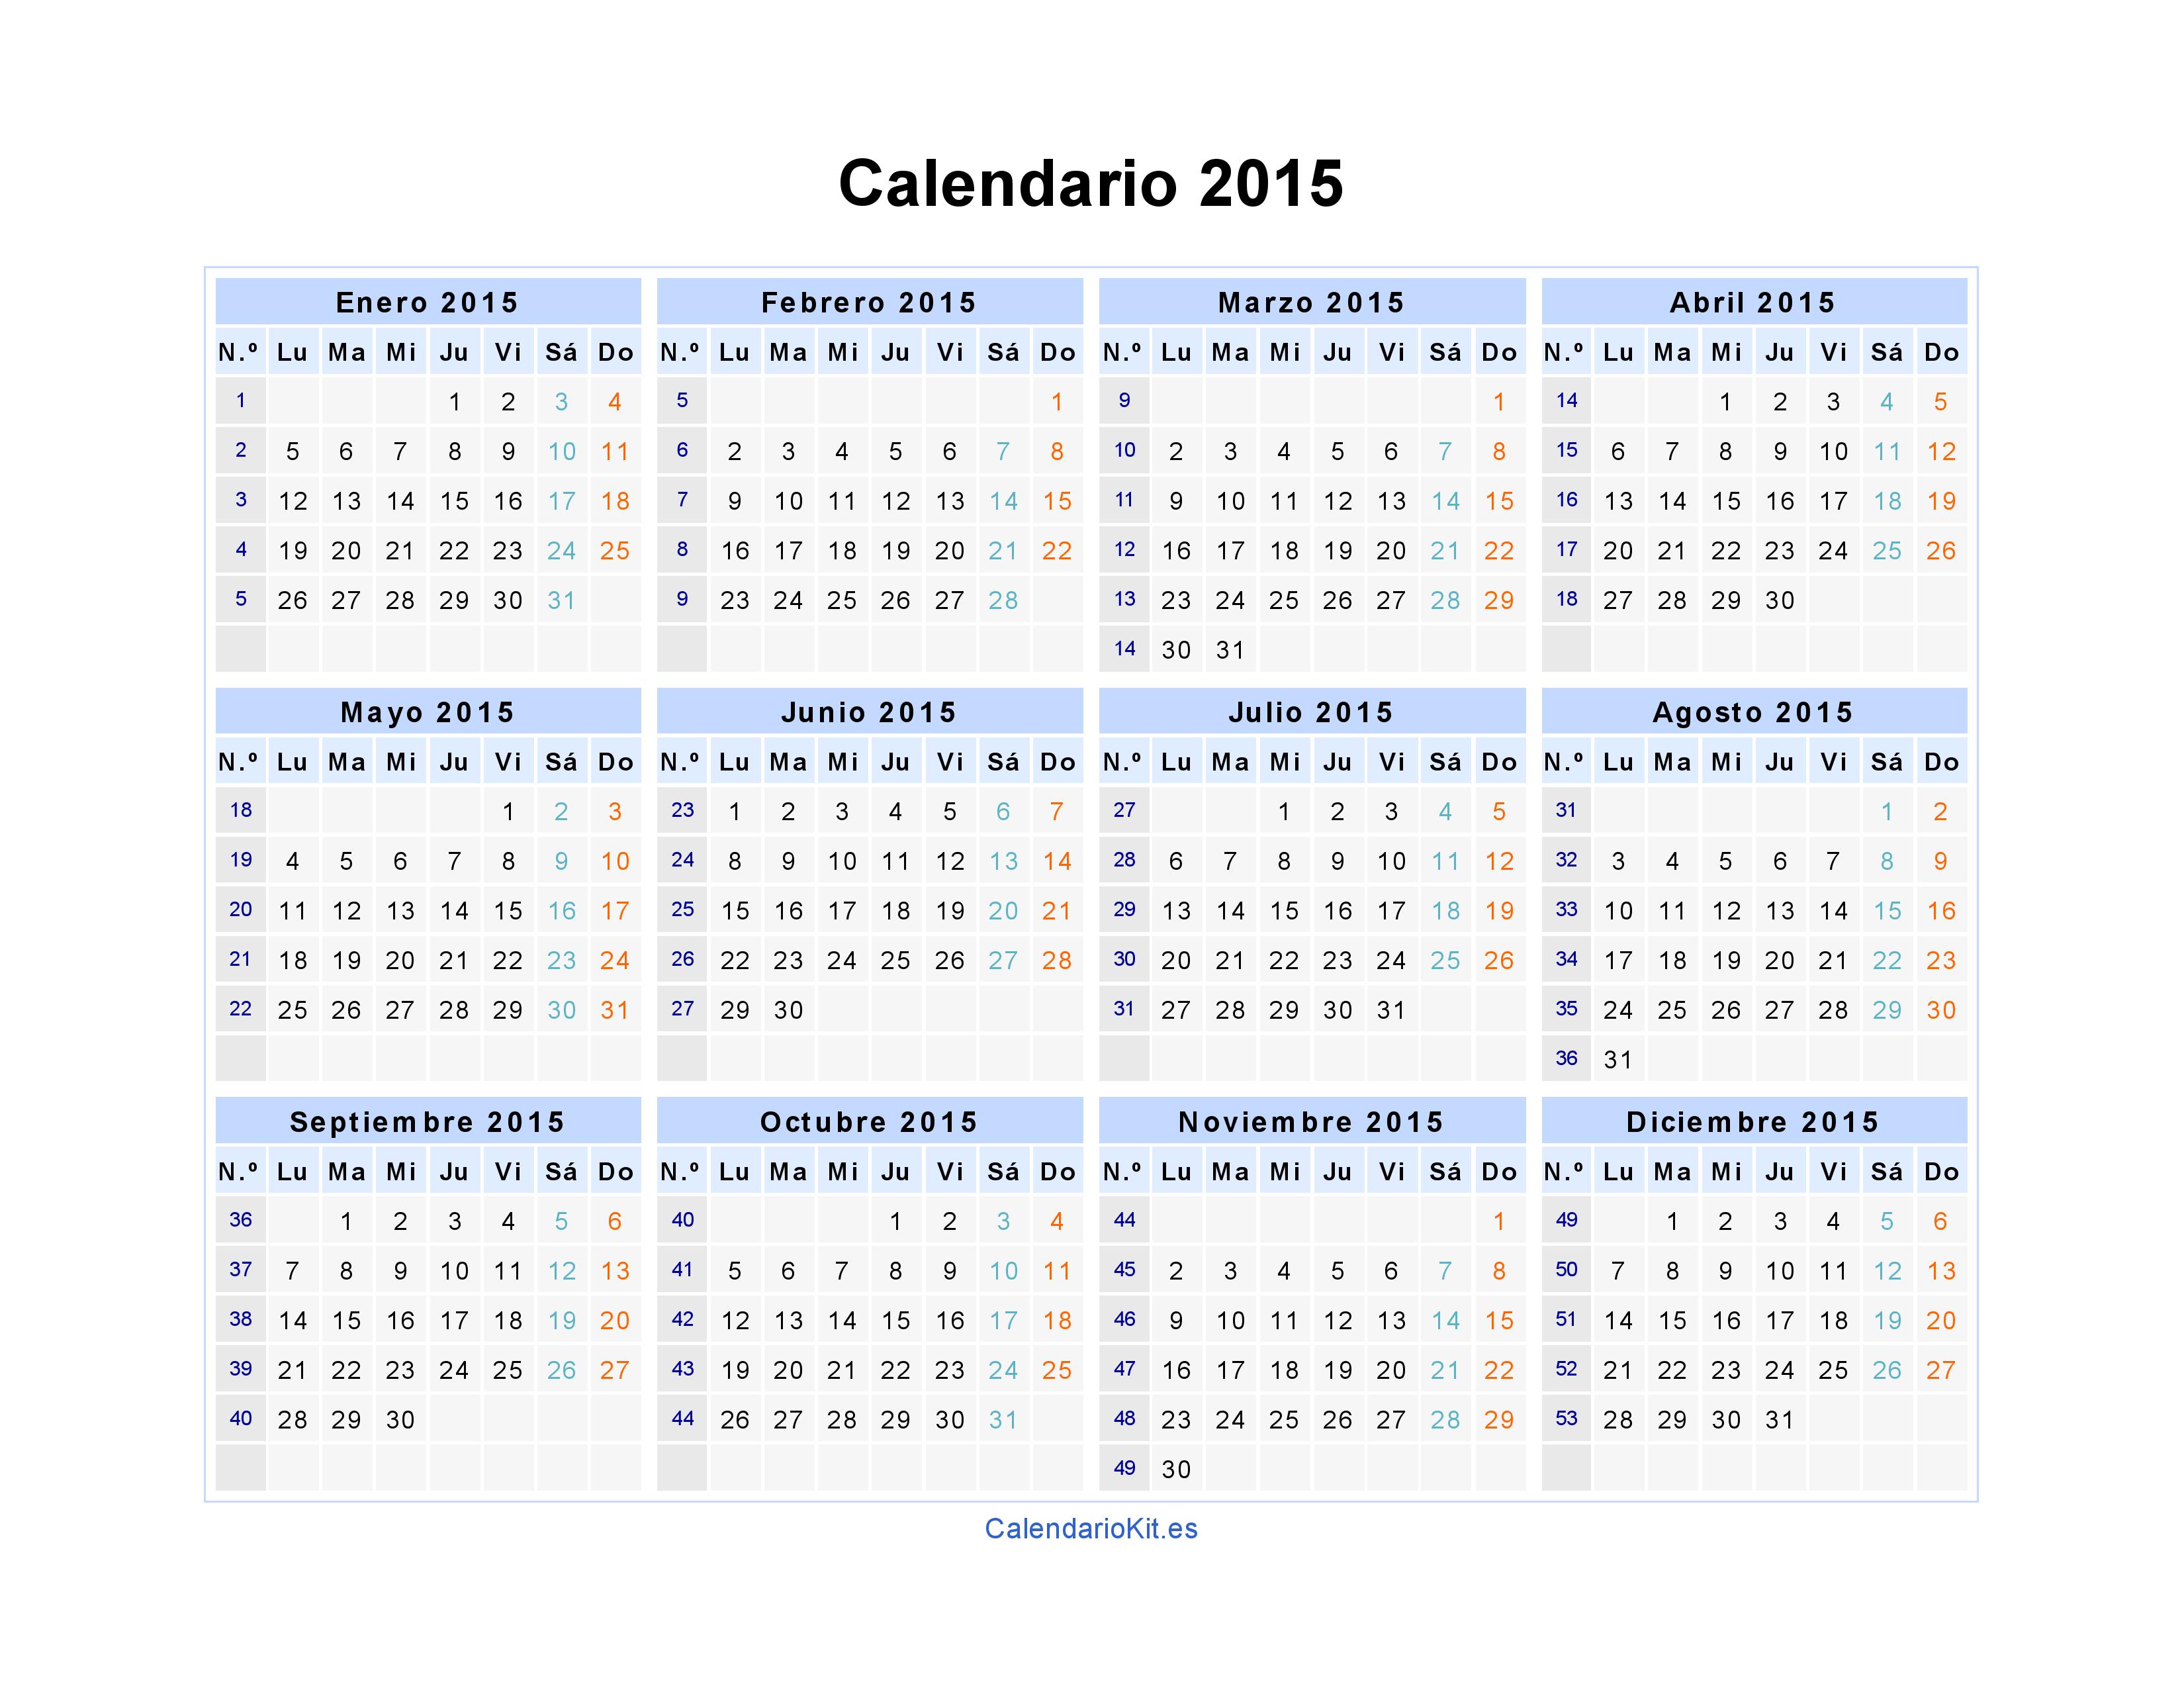 imprimir archives calendario 2015 | News to Go 2 | Pinterest ...